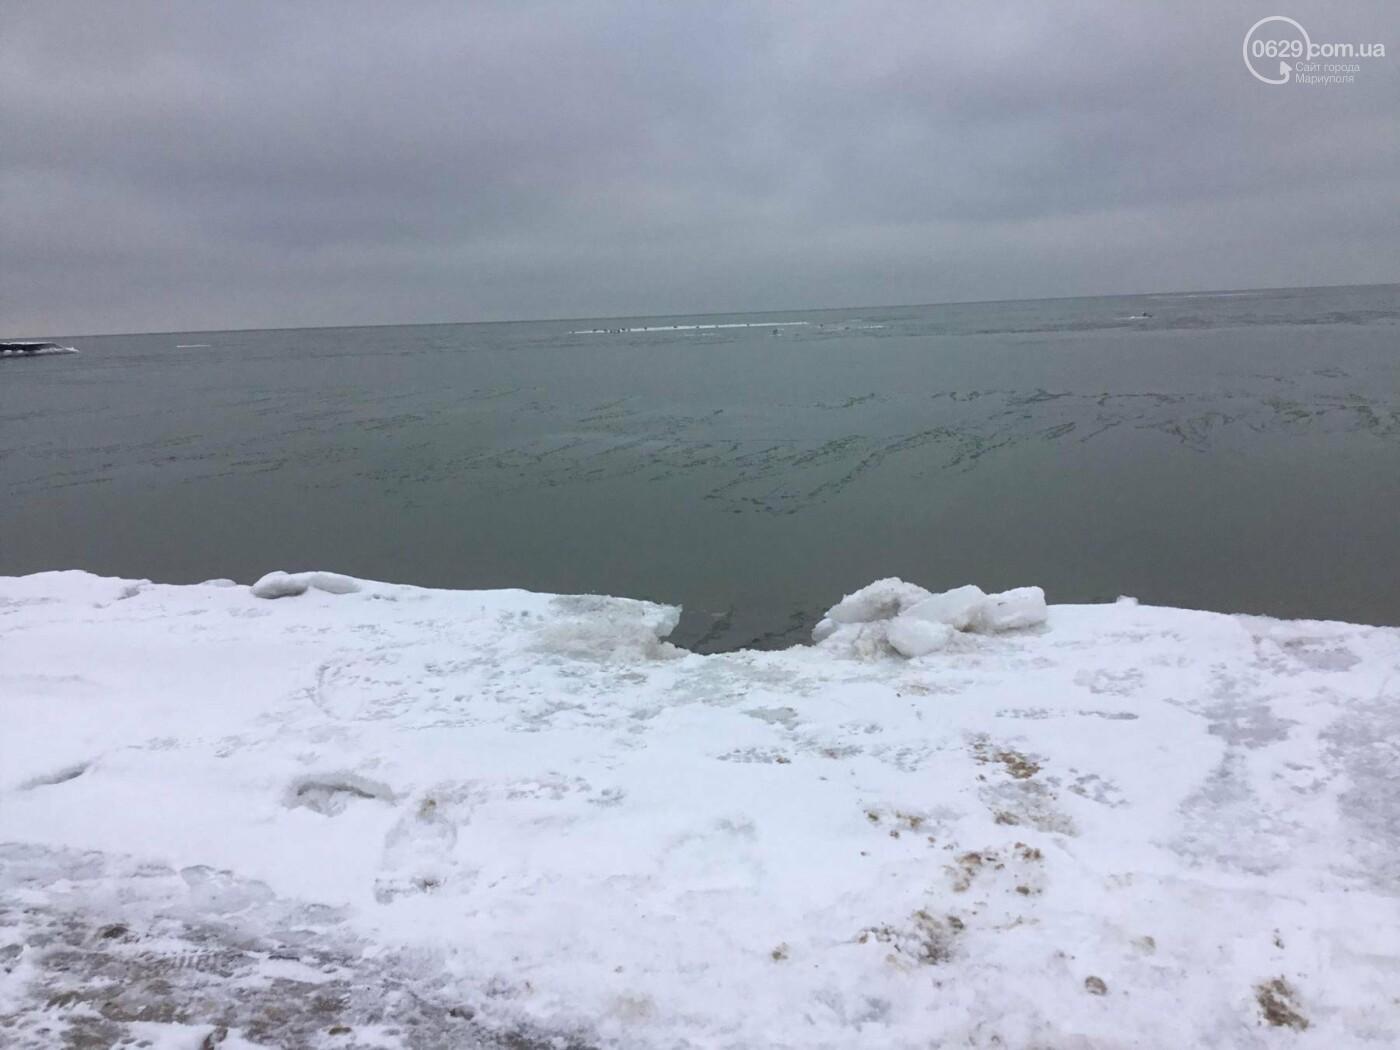 В Мариуполе на море появилась ледяная корка (Фотофакт), фото-7